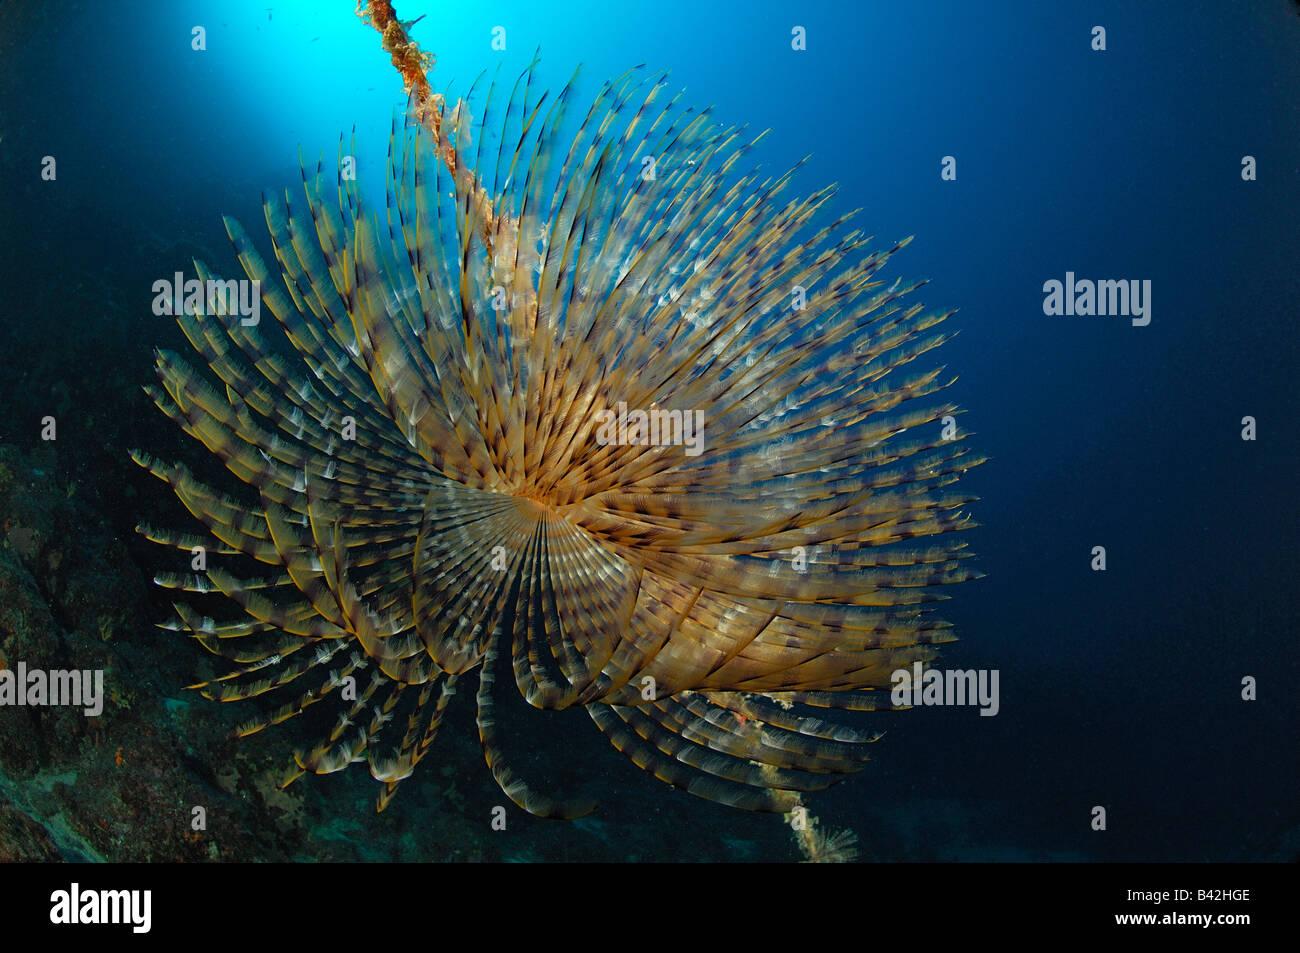 Spirographis Fan Worm Spirographis spallanzani Maun Island Adriatic Sea Croatia - Stock Image